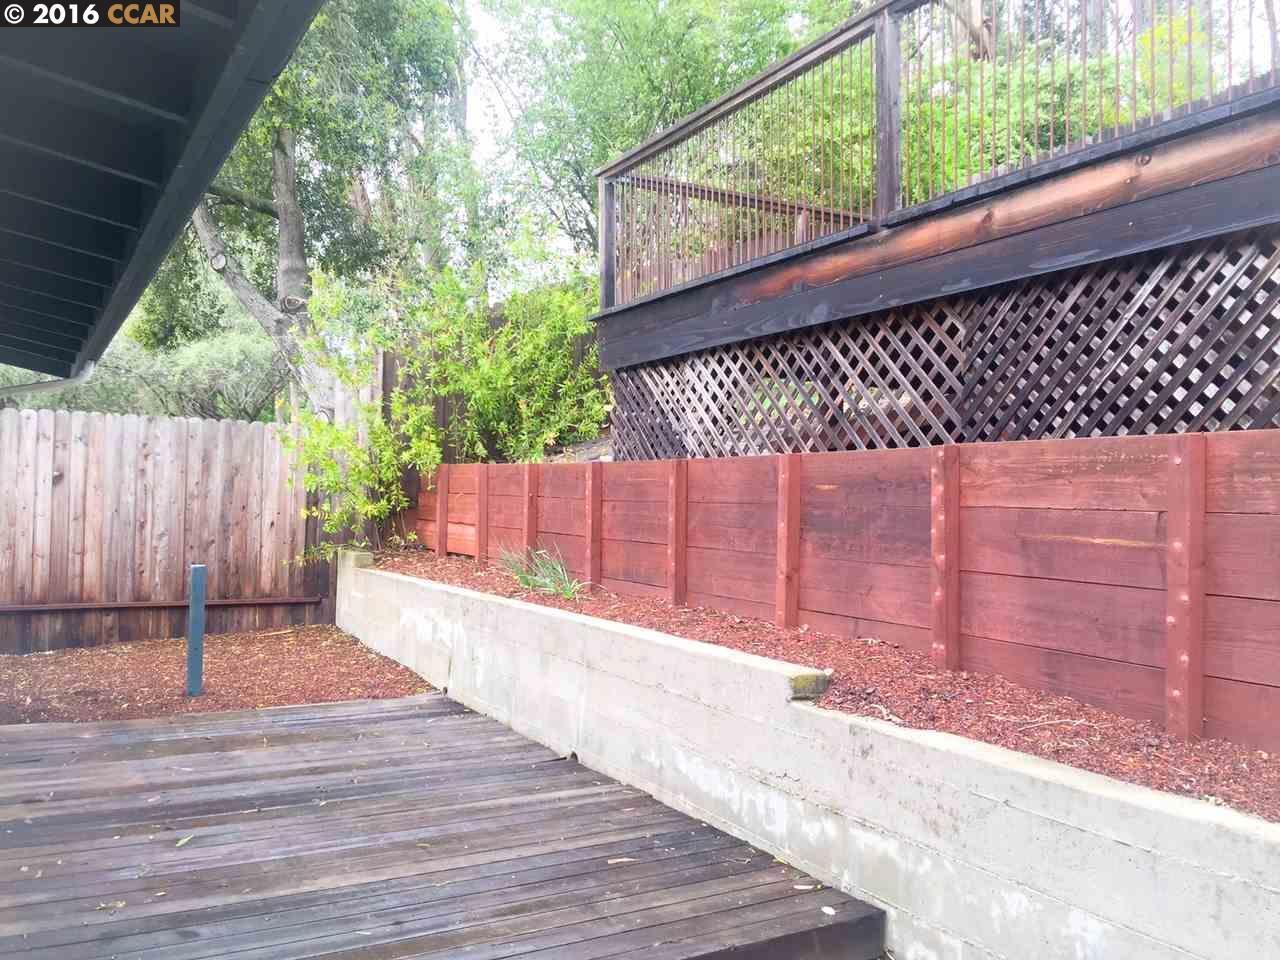 Additional photo for property listing at 40 WESTWOOD Court  Oakland, Kalifornien 94611 Vereinigte Staaten